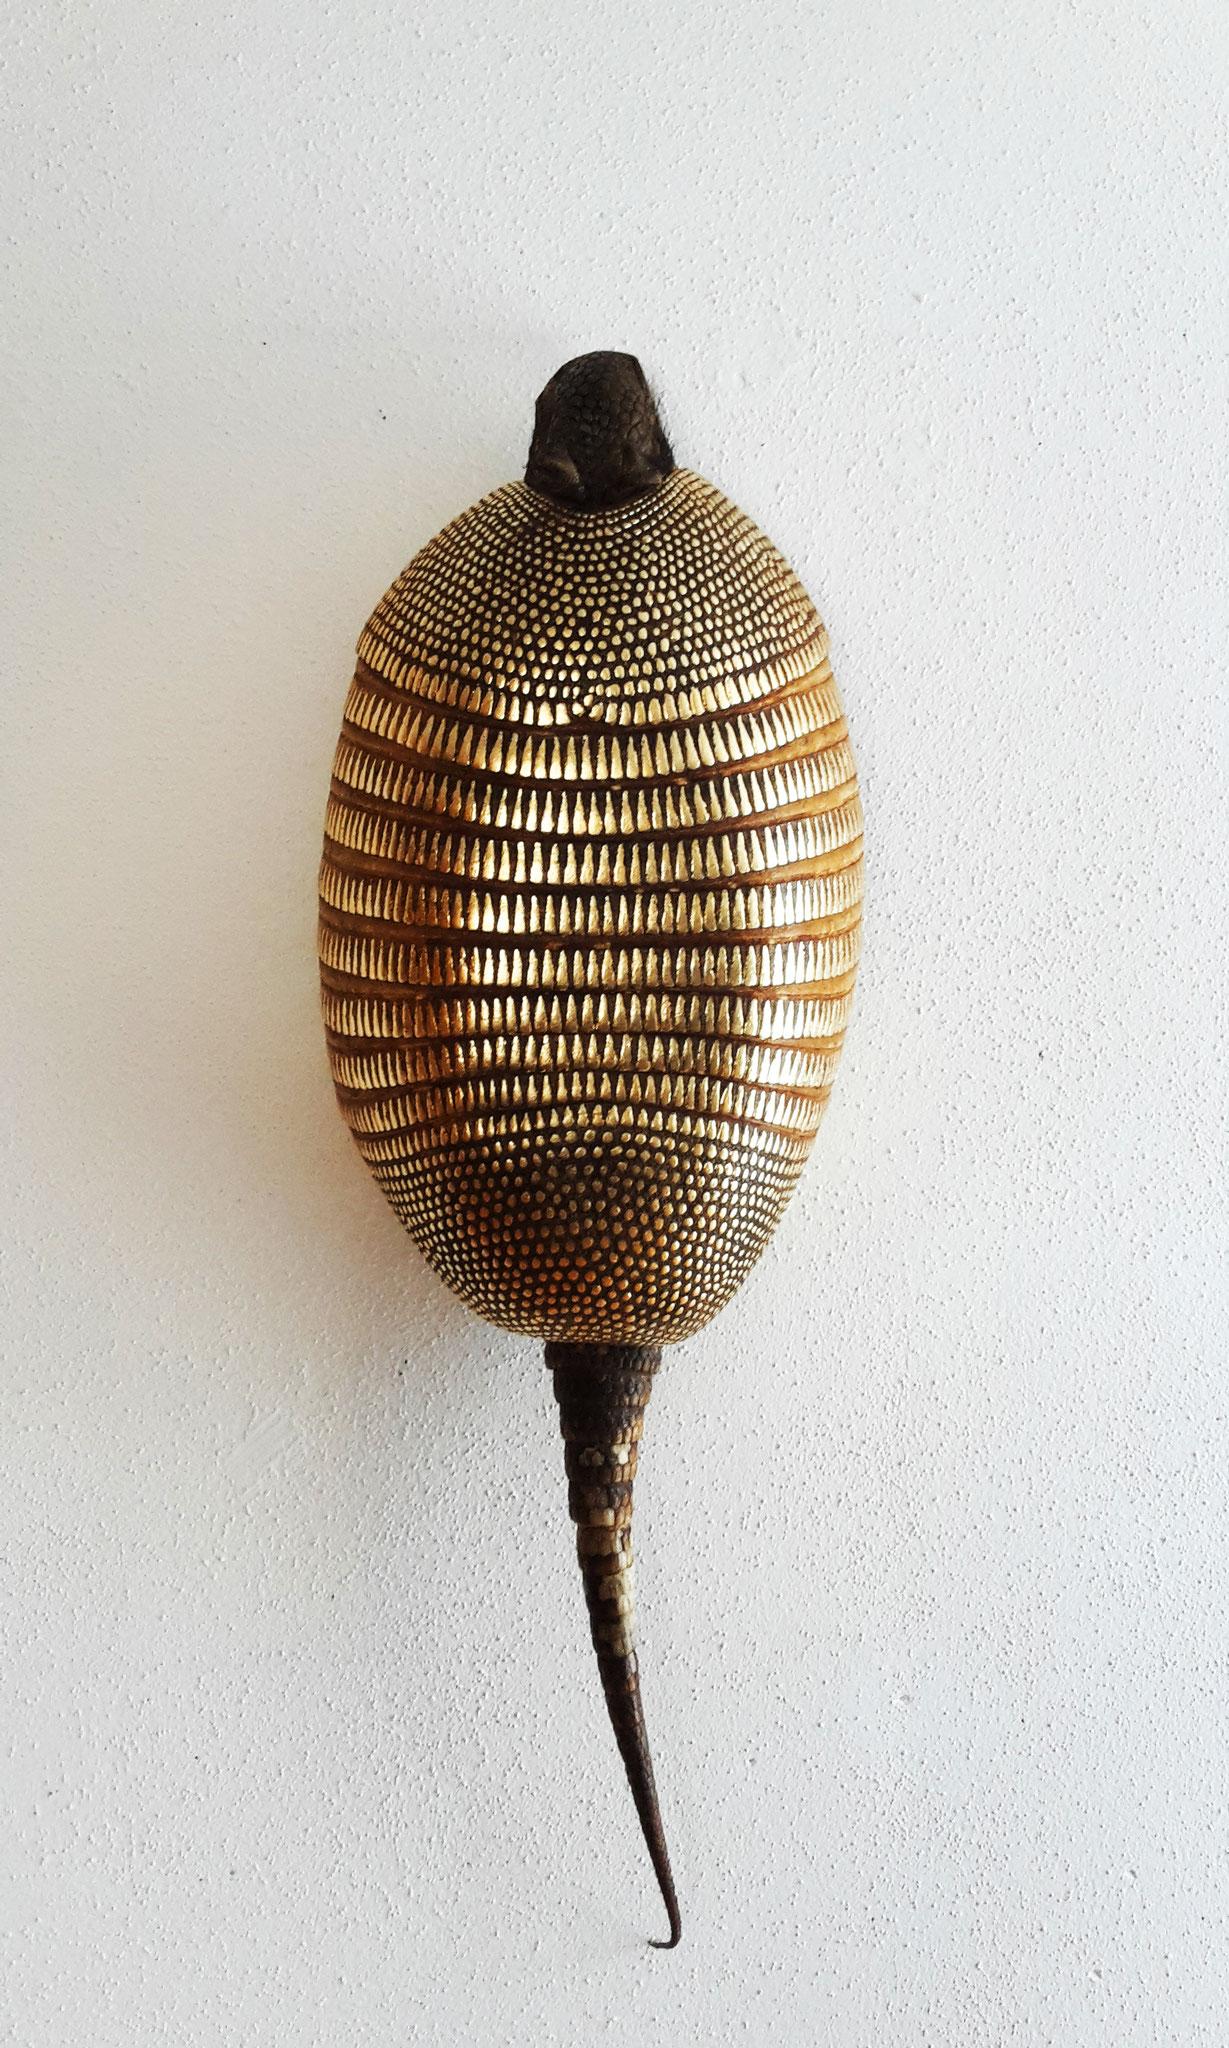 Armadillo Totem, 2018, 22 carat gold-plated armadillo carapace, 74x25x13cm